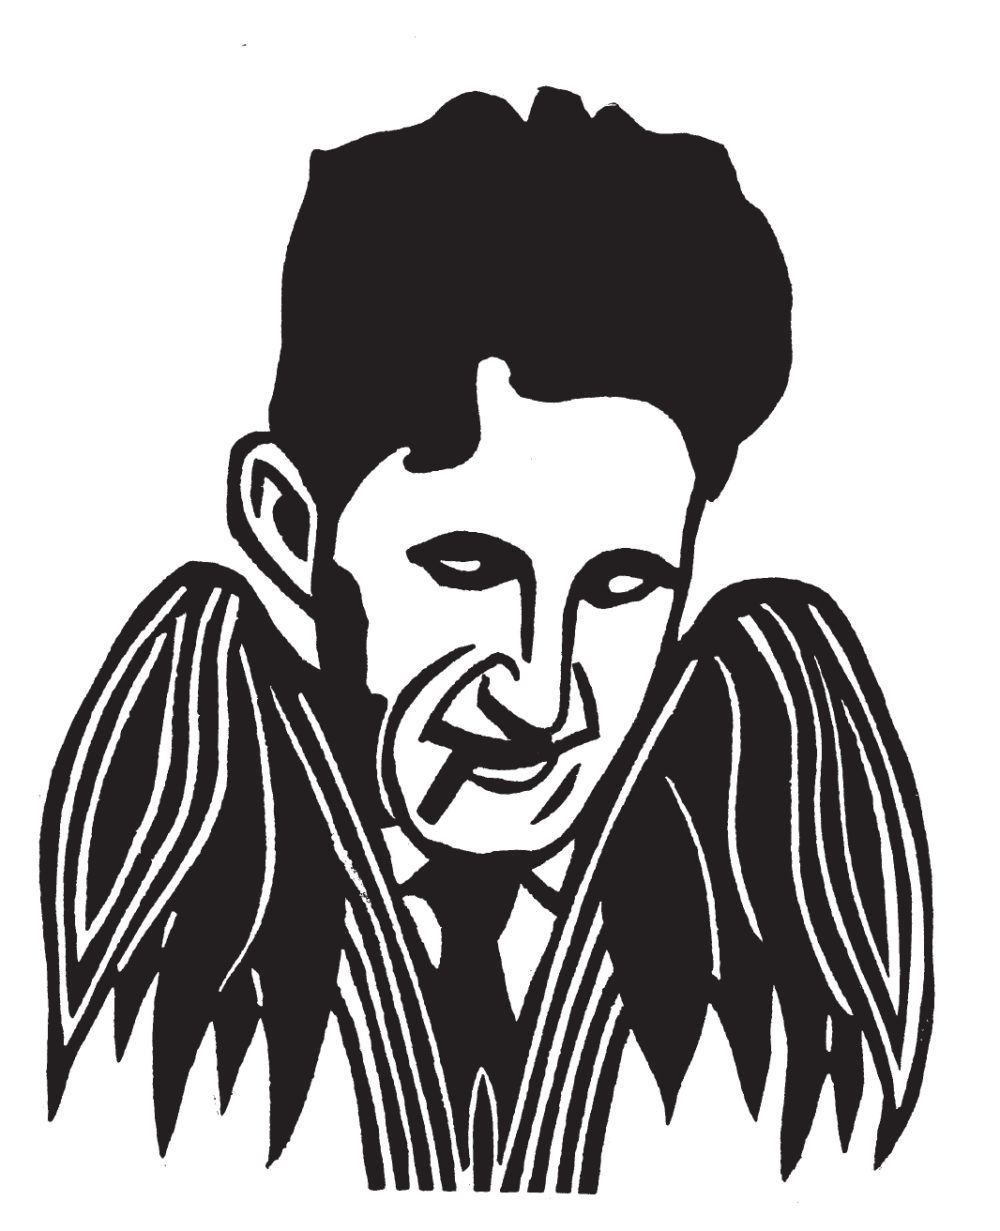 Mark Handley - Gordon Bowker on George Orwell,Keep the Aspidistra Flying